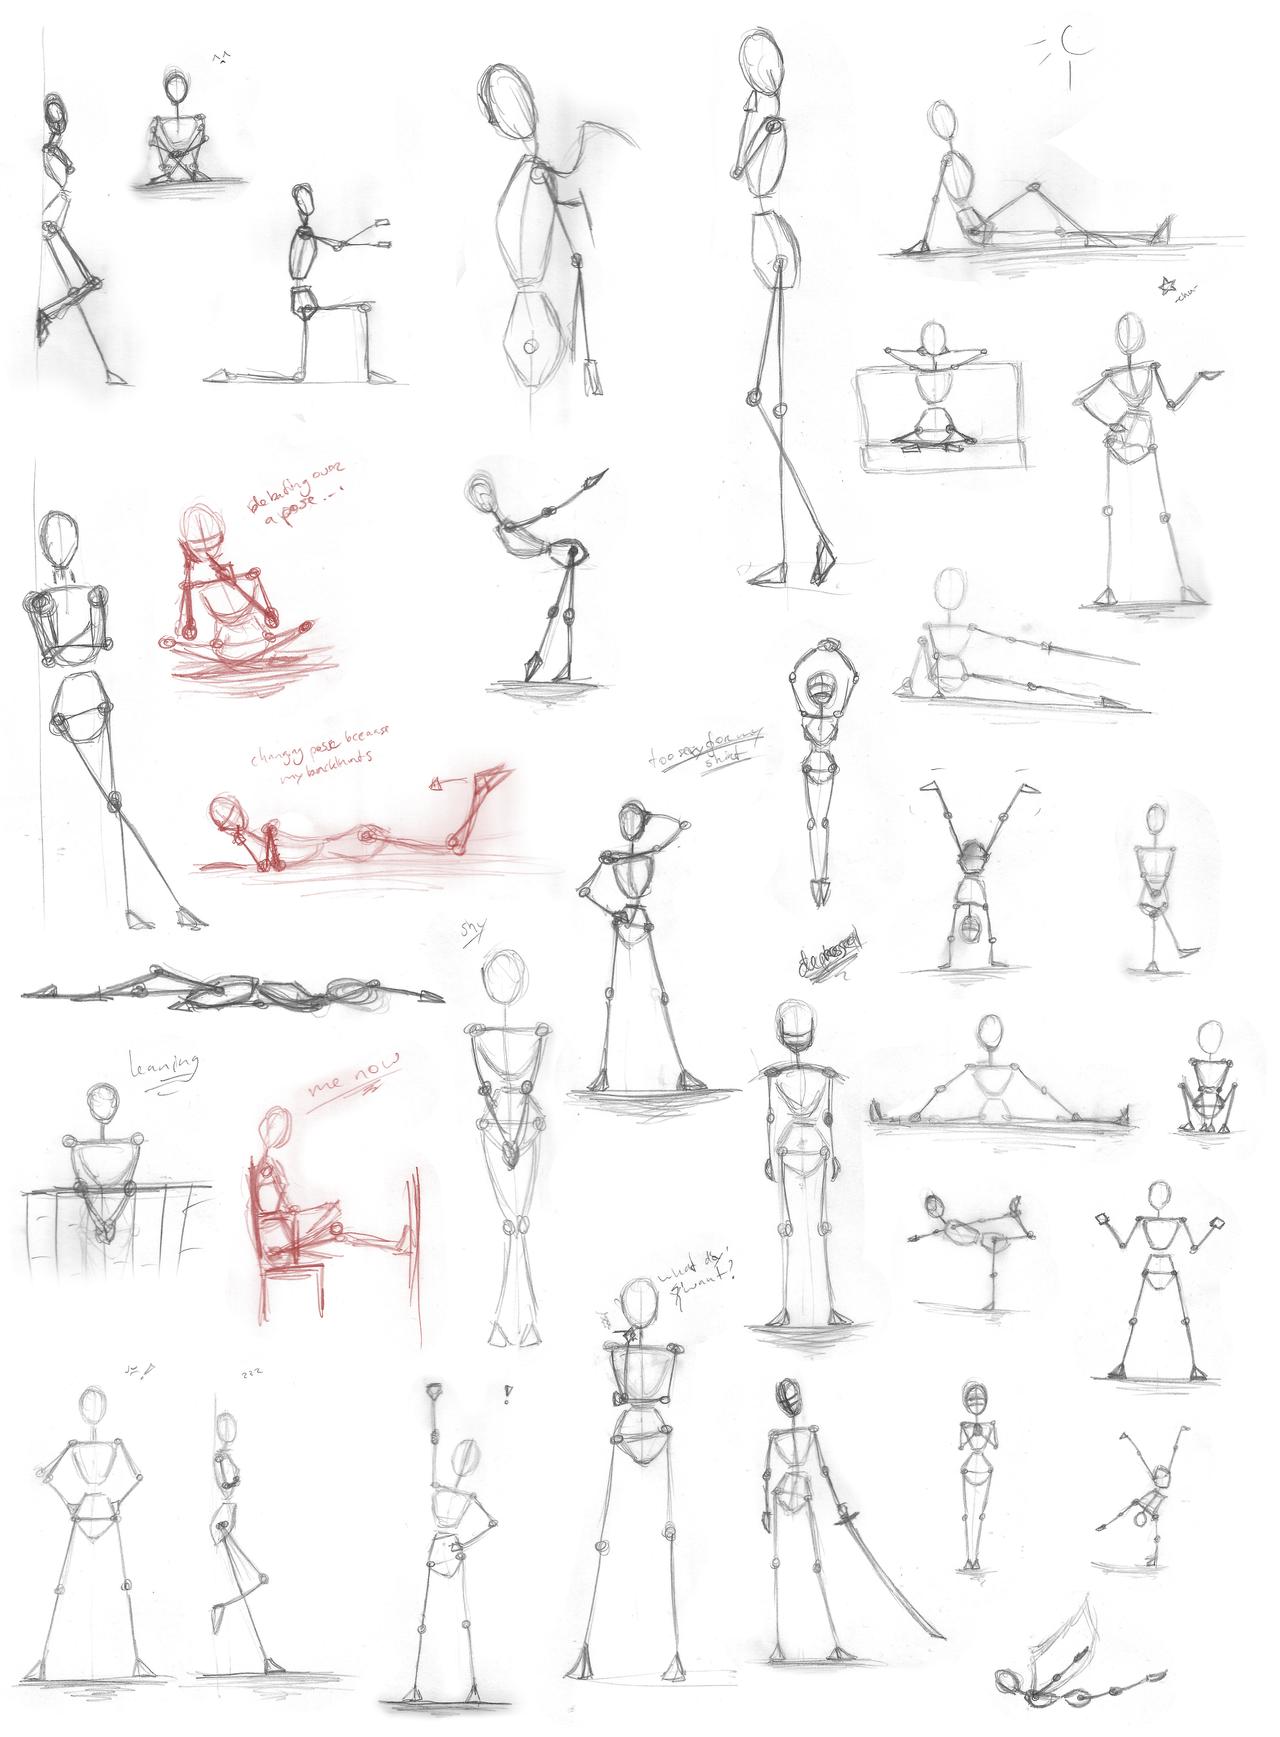 Pose Practice stick-figures by Iduna-Haya on DeviantArt